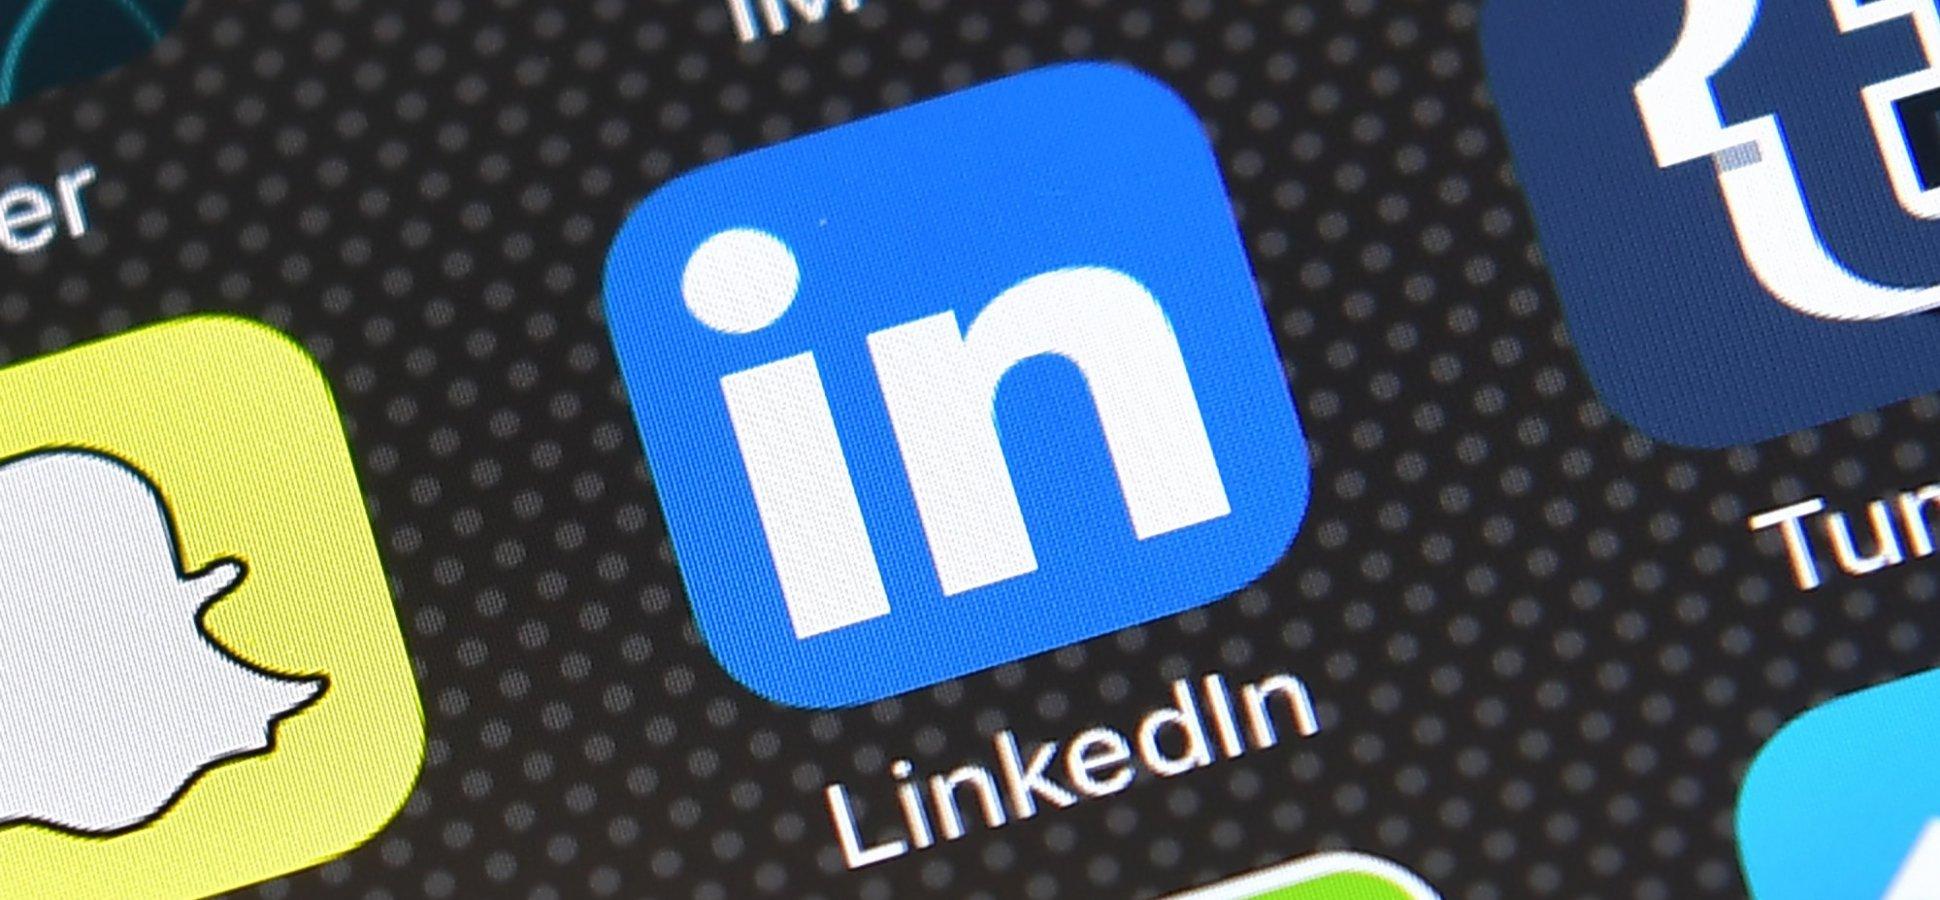 New LinkedIn Tools Help Job Hunters Ace Job Interviews